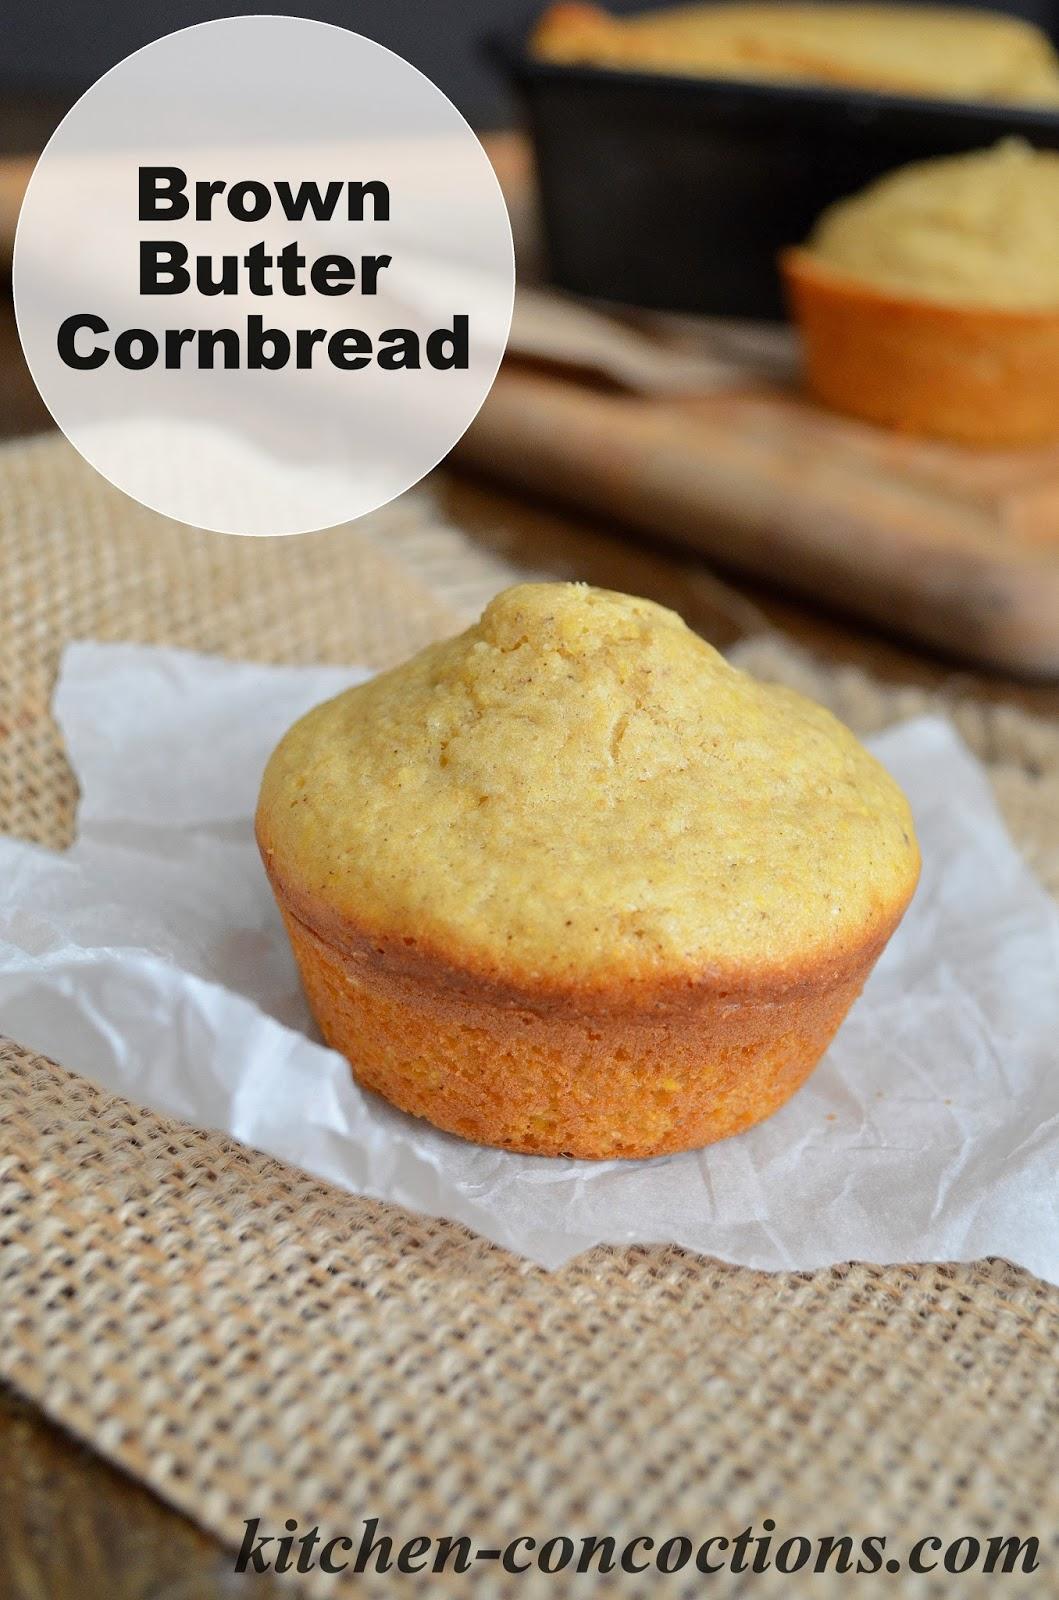 Brown Butter Cornbread - Kitchen Concoctions